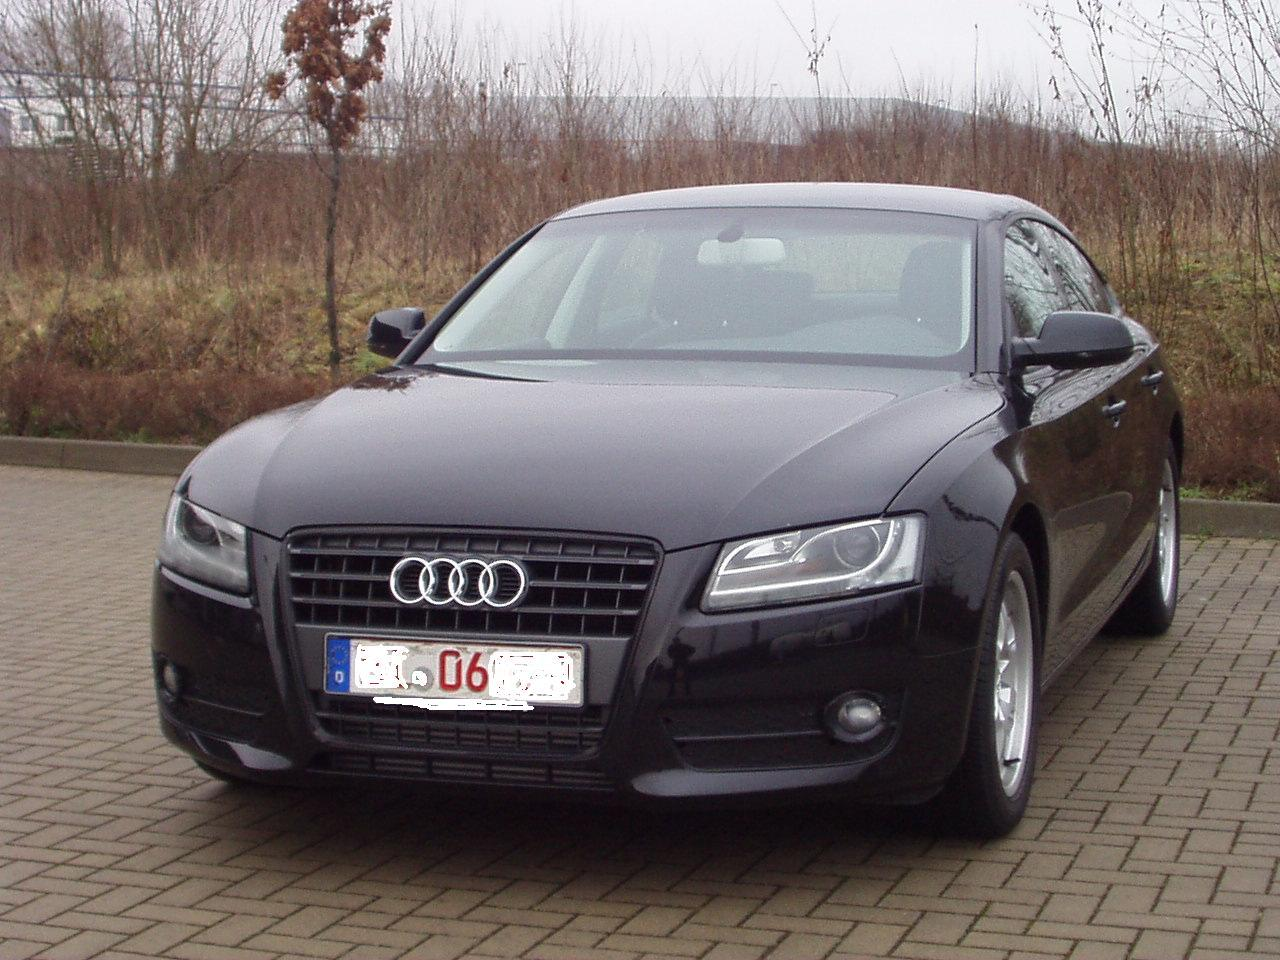 Audi A5 Schwarz 015 Unsicherheit Wg Optikpaket Schwarz